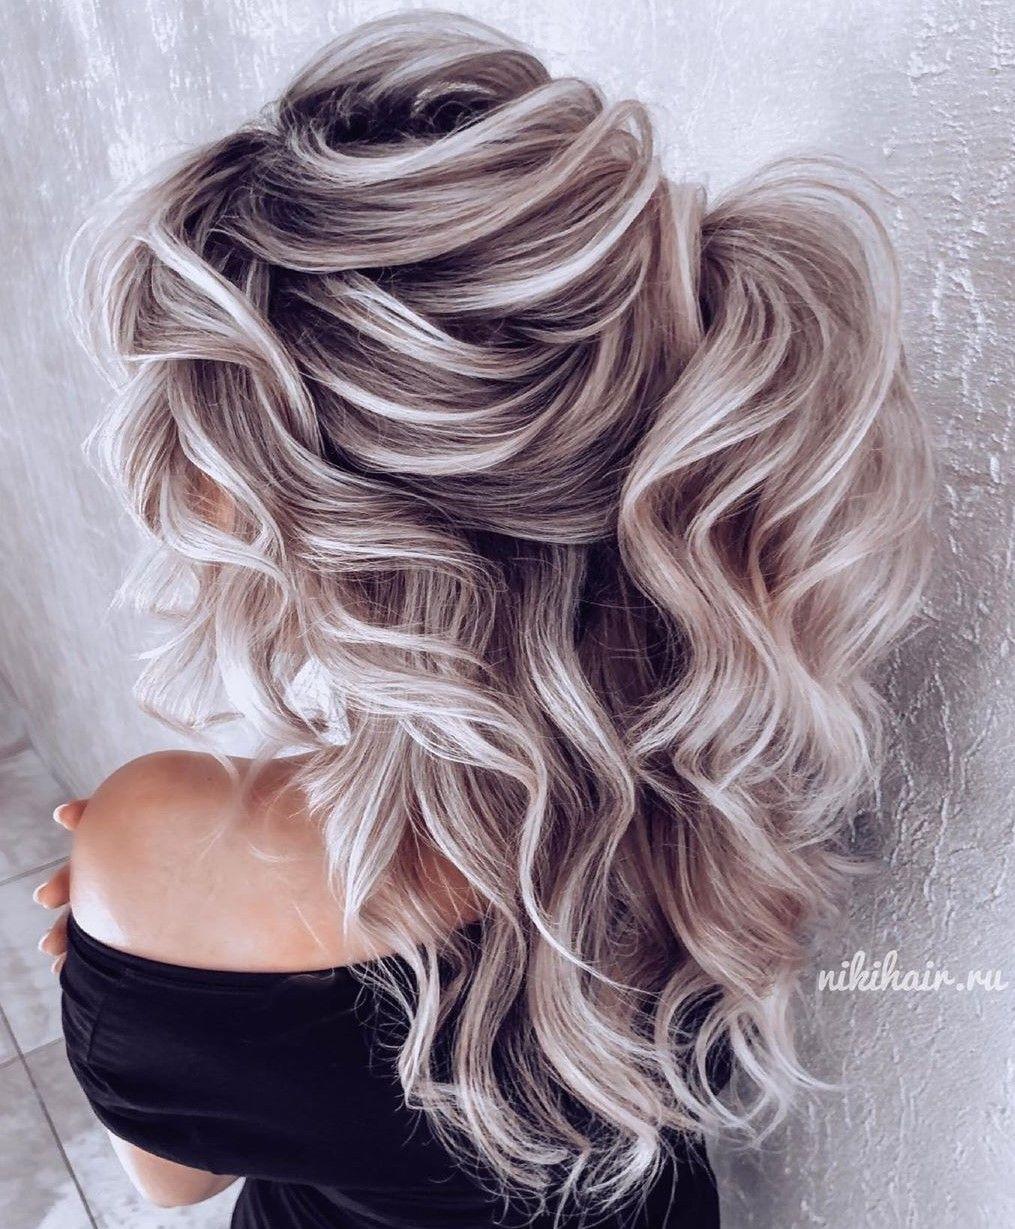 50 Trendiest Half-Up Half-Down Hairstyles for 2021